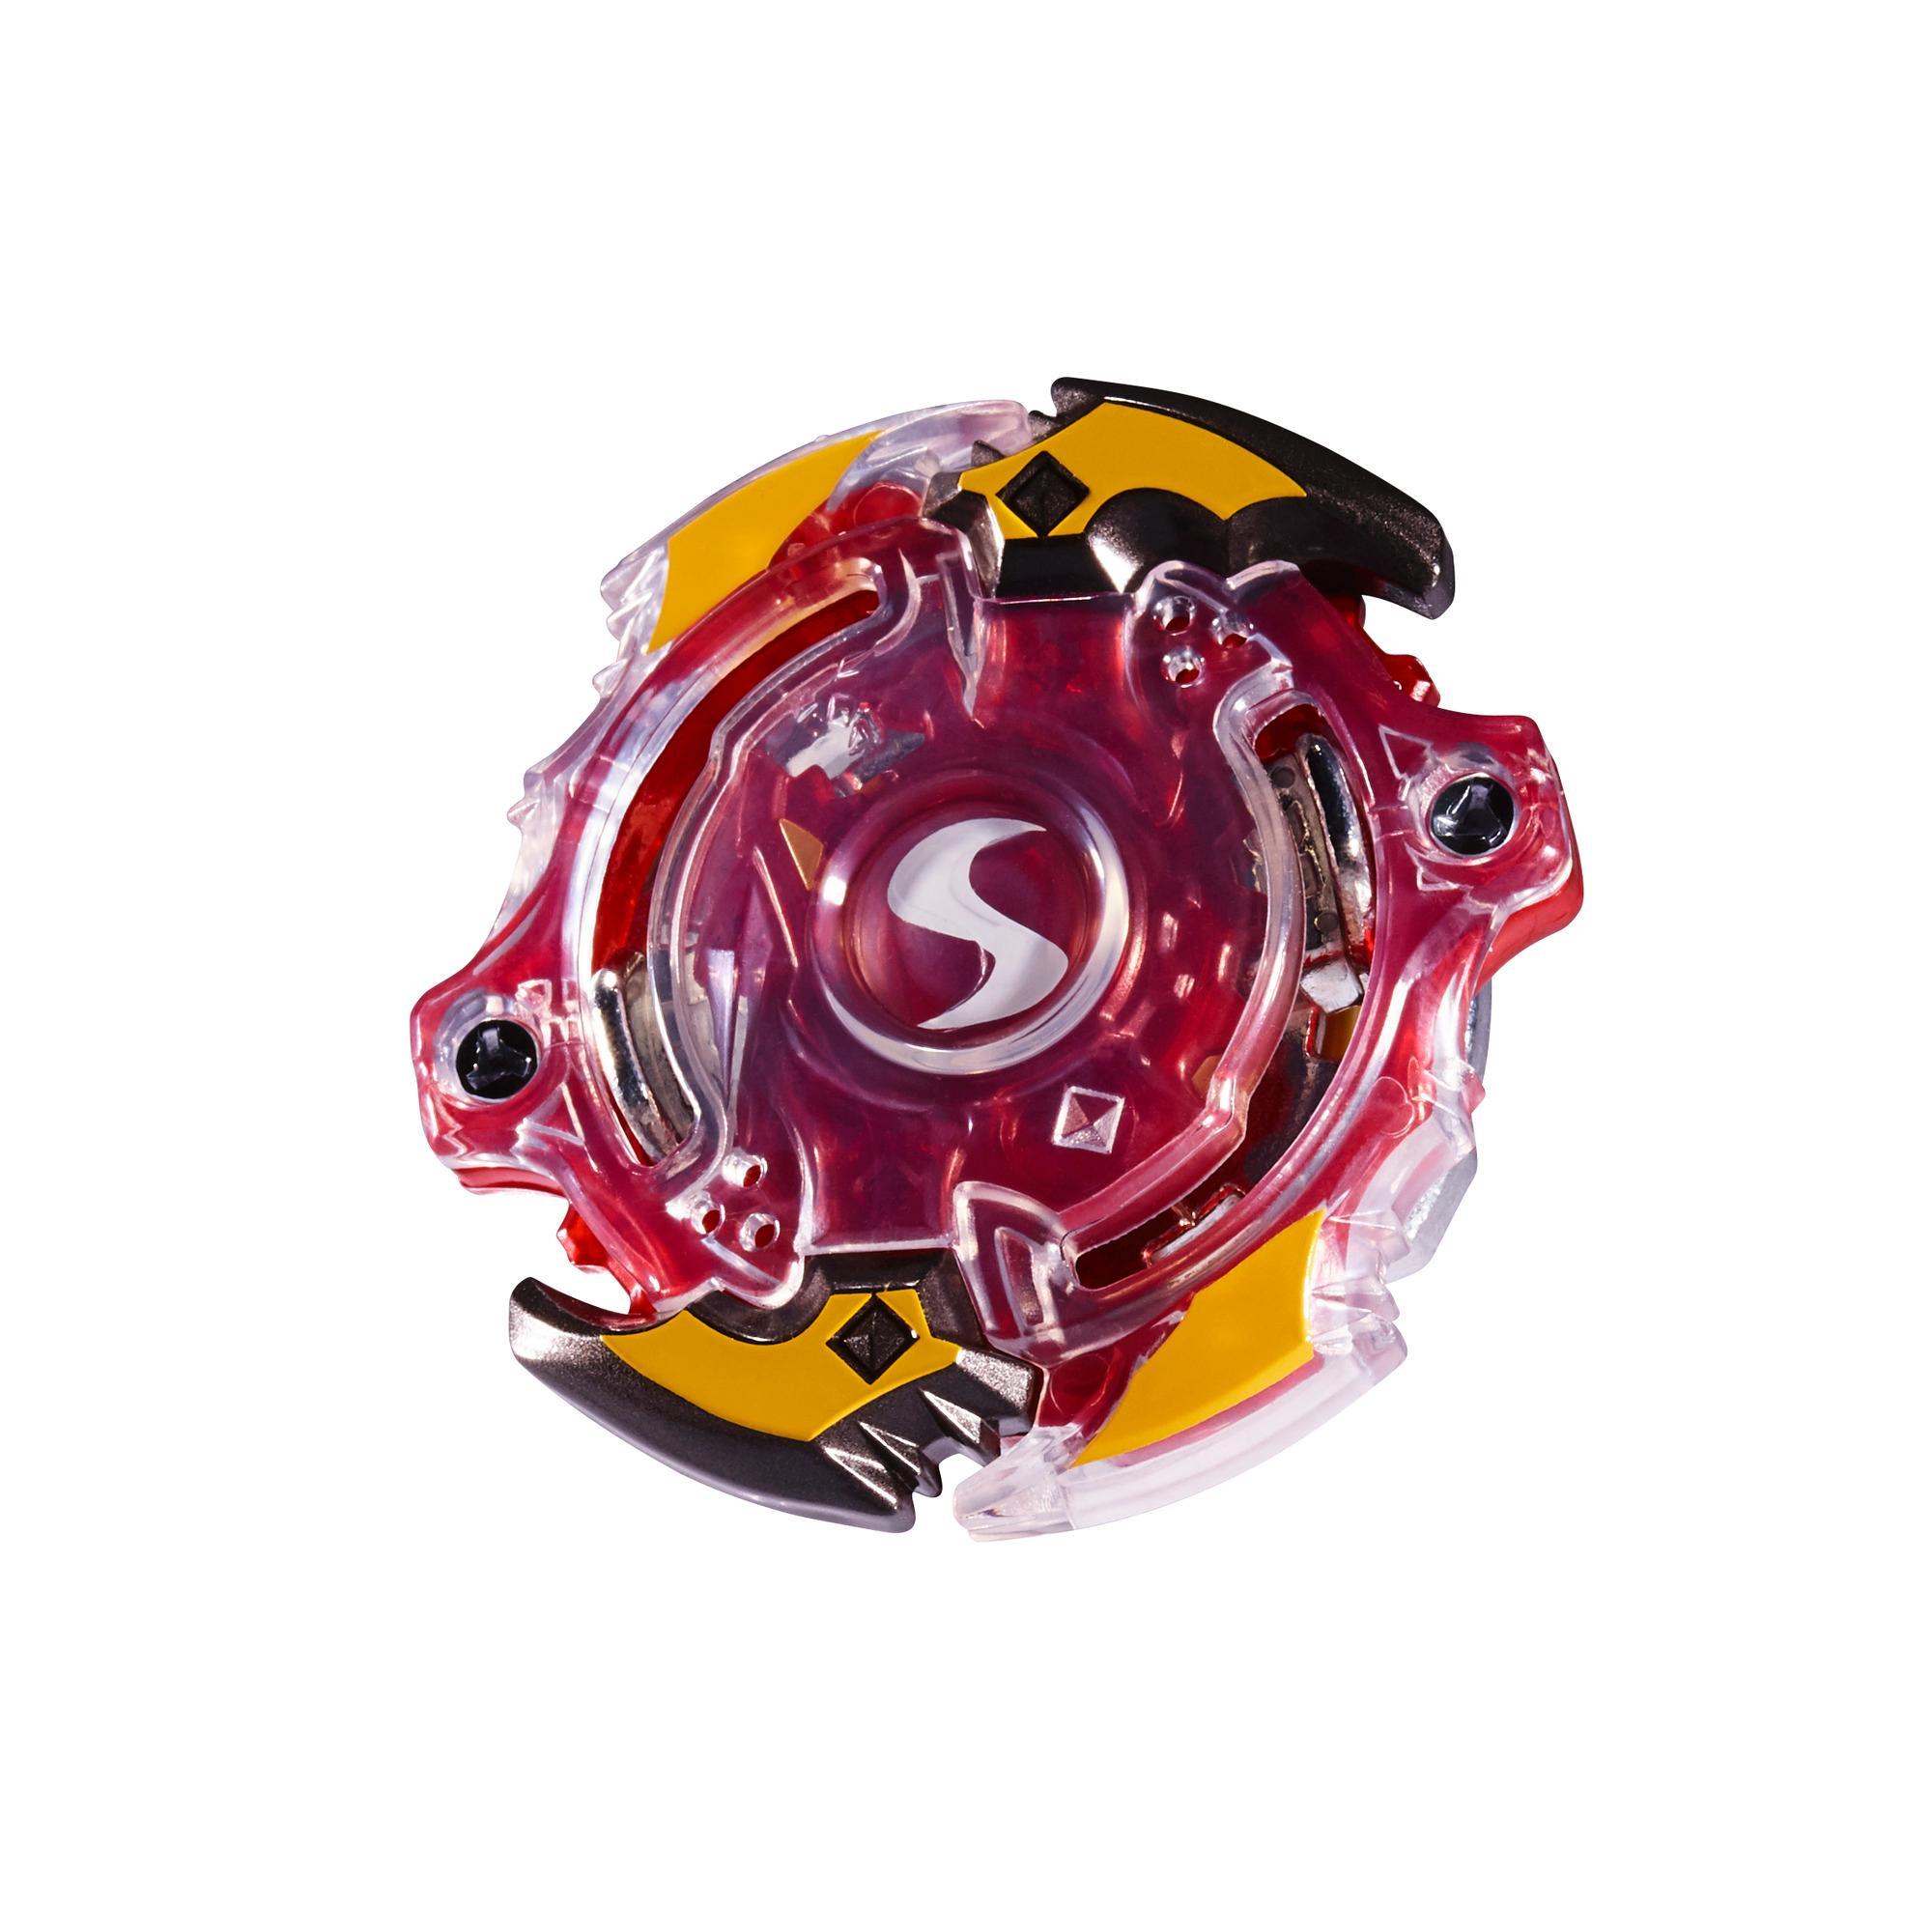 Beyblade Burst Başlangıç Paketi - Spryzen S2